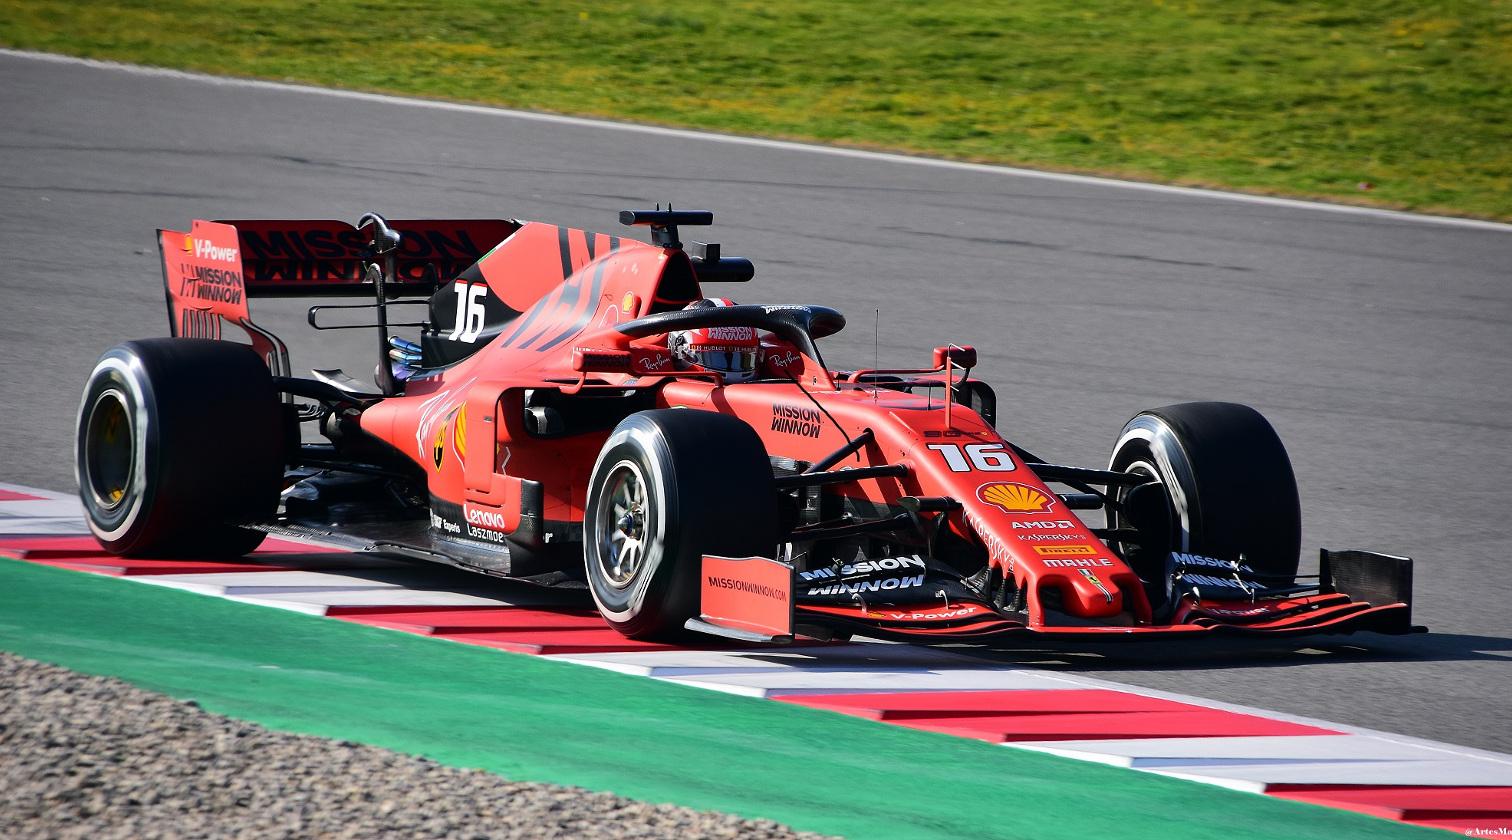 Charles Leclerc testing his Ferrari